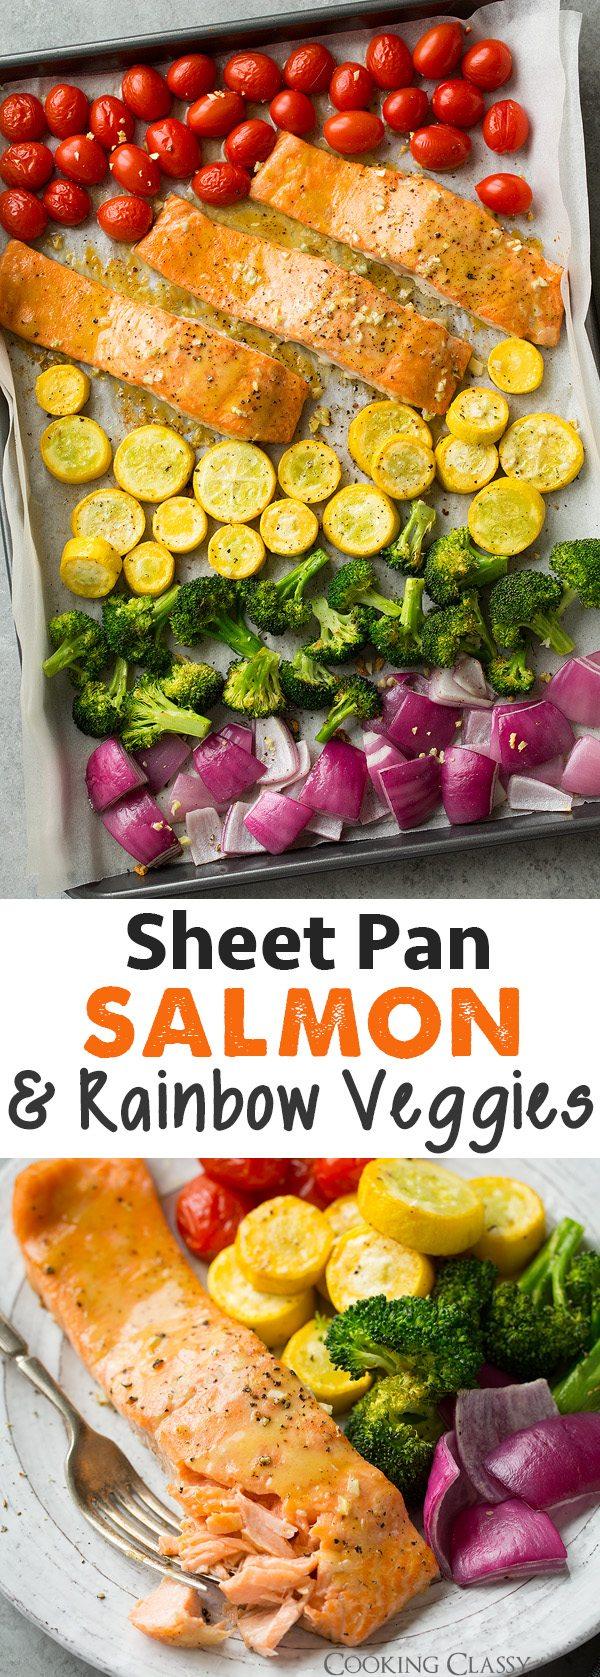 http://www.cookingclassy.com/wp-content/uploads/2017/01/sheet-pan-salmon-rainbow-veggies-10.jpg